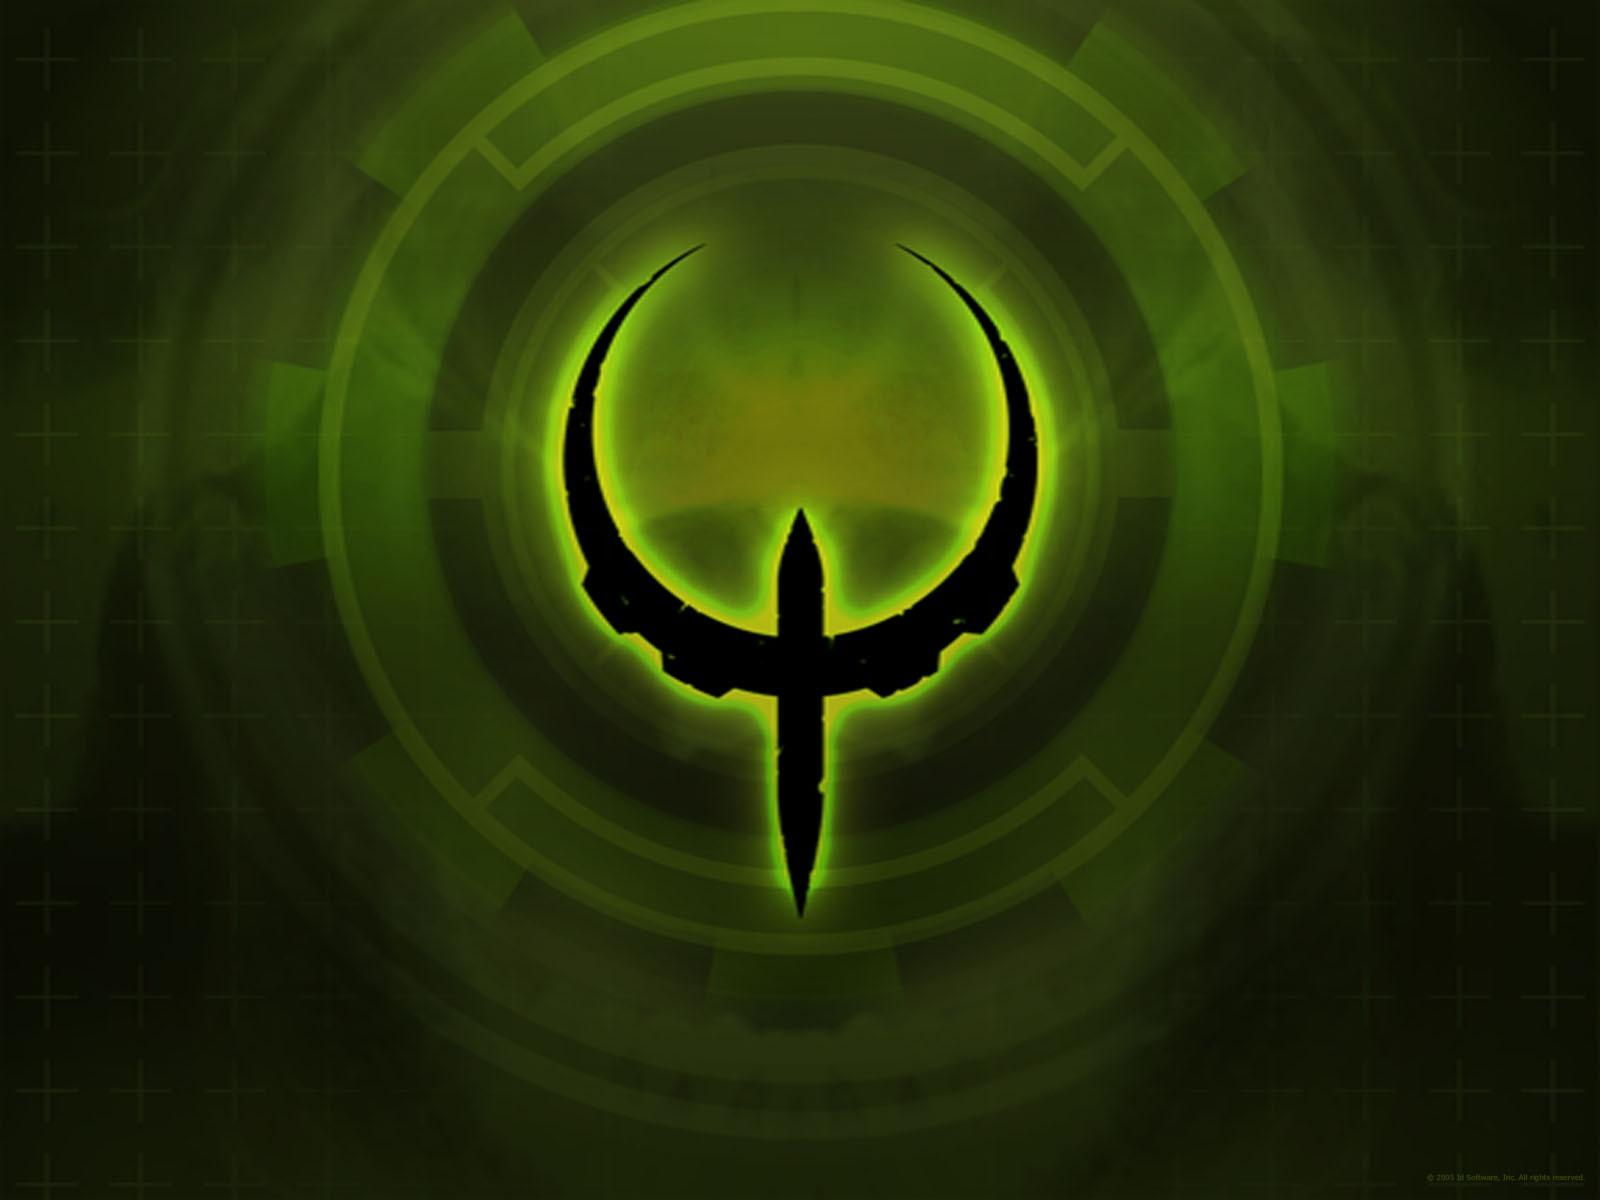 http://1.bp.blogspot.com/-UflSyyGbKsg/UM_bB3w5VTI/AAAAAAAABsI/a0ovi_Ww4yE/s1600/logo+wallpaper.jpg